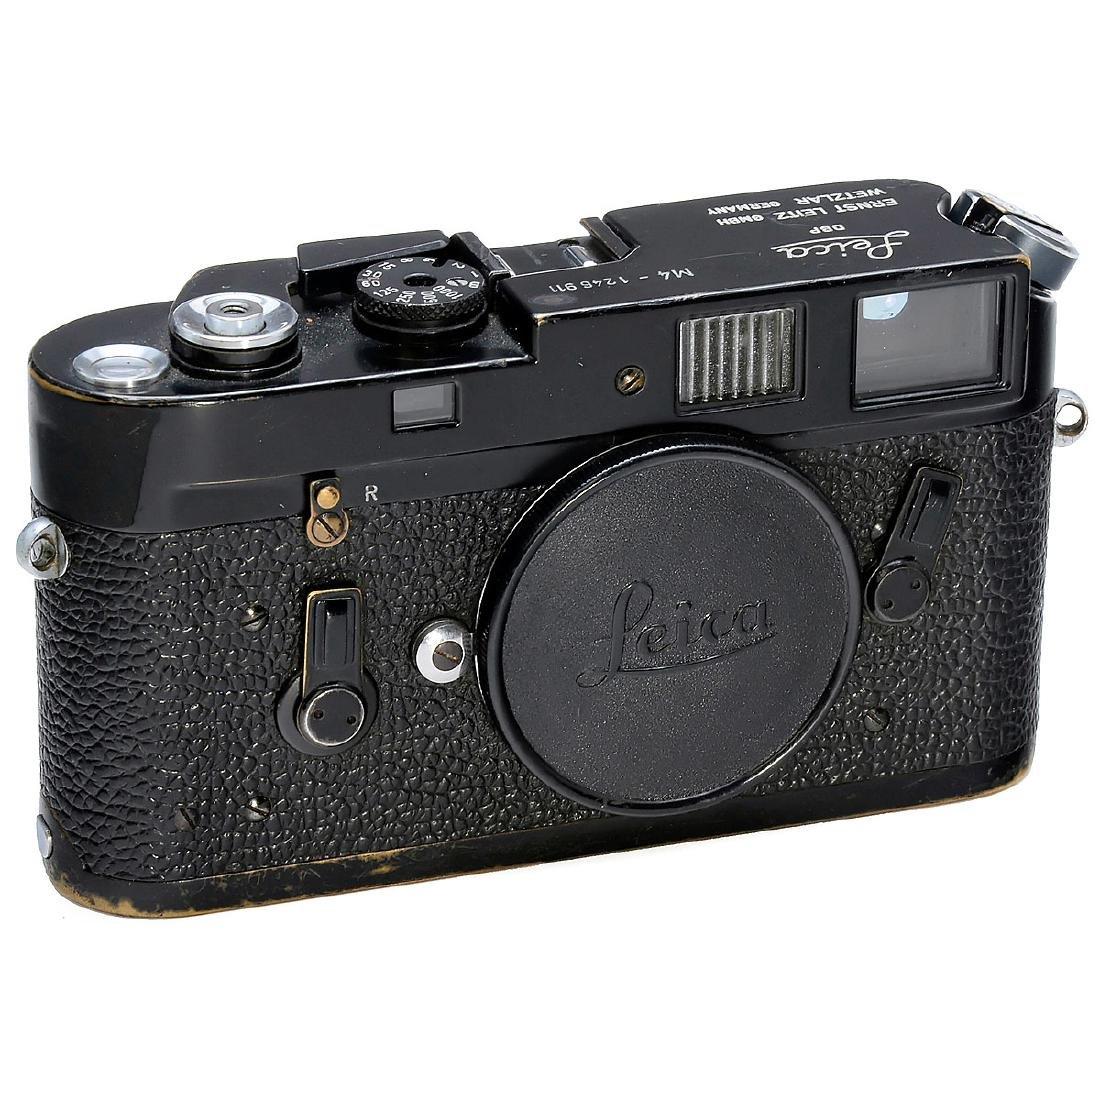 Leica M4 (Black Paint), 1969